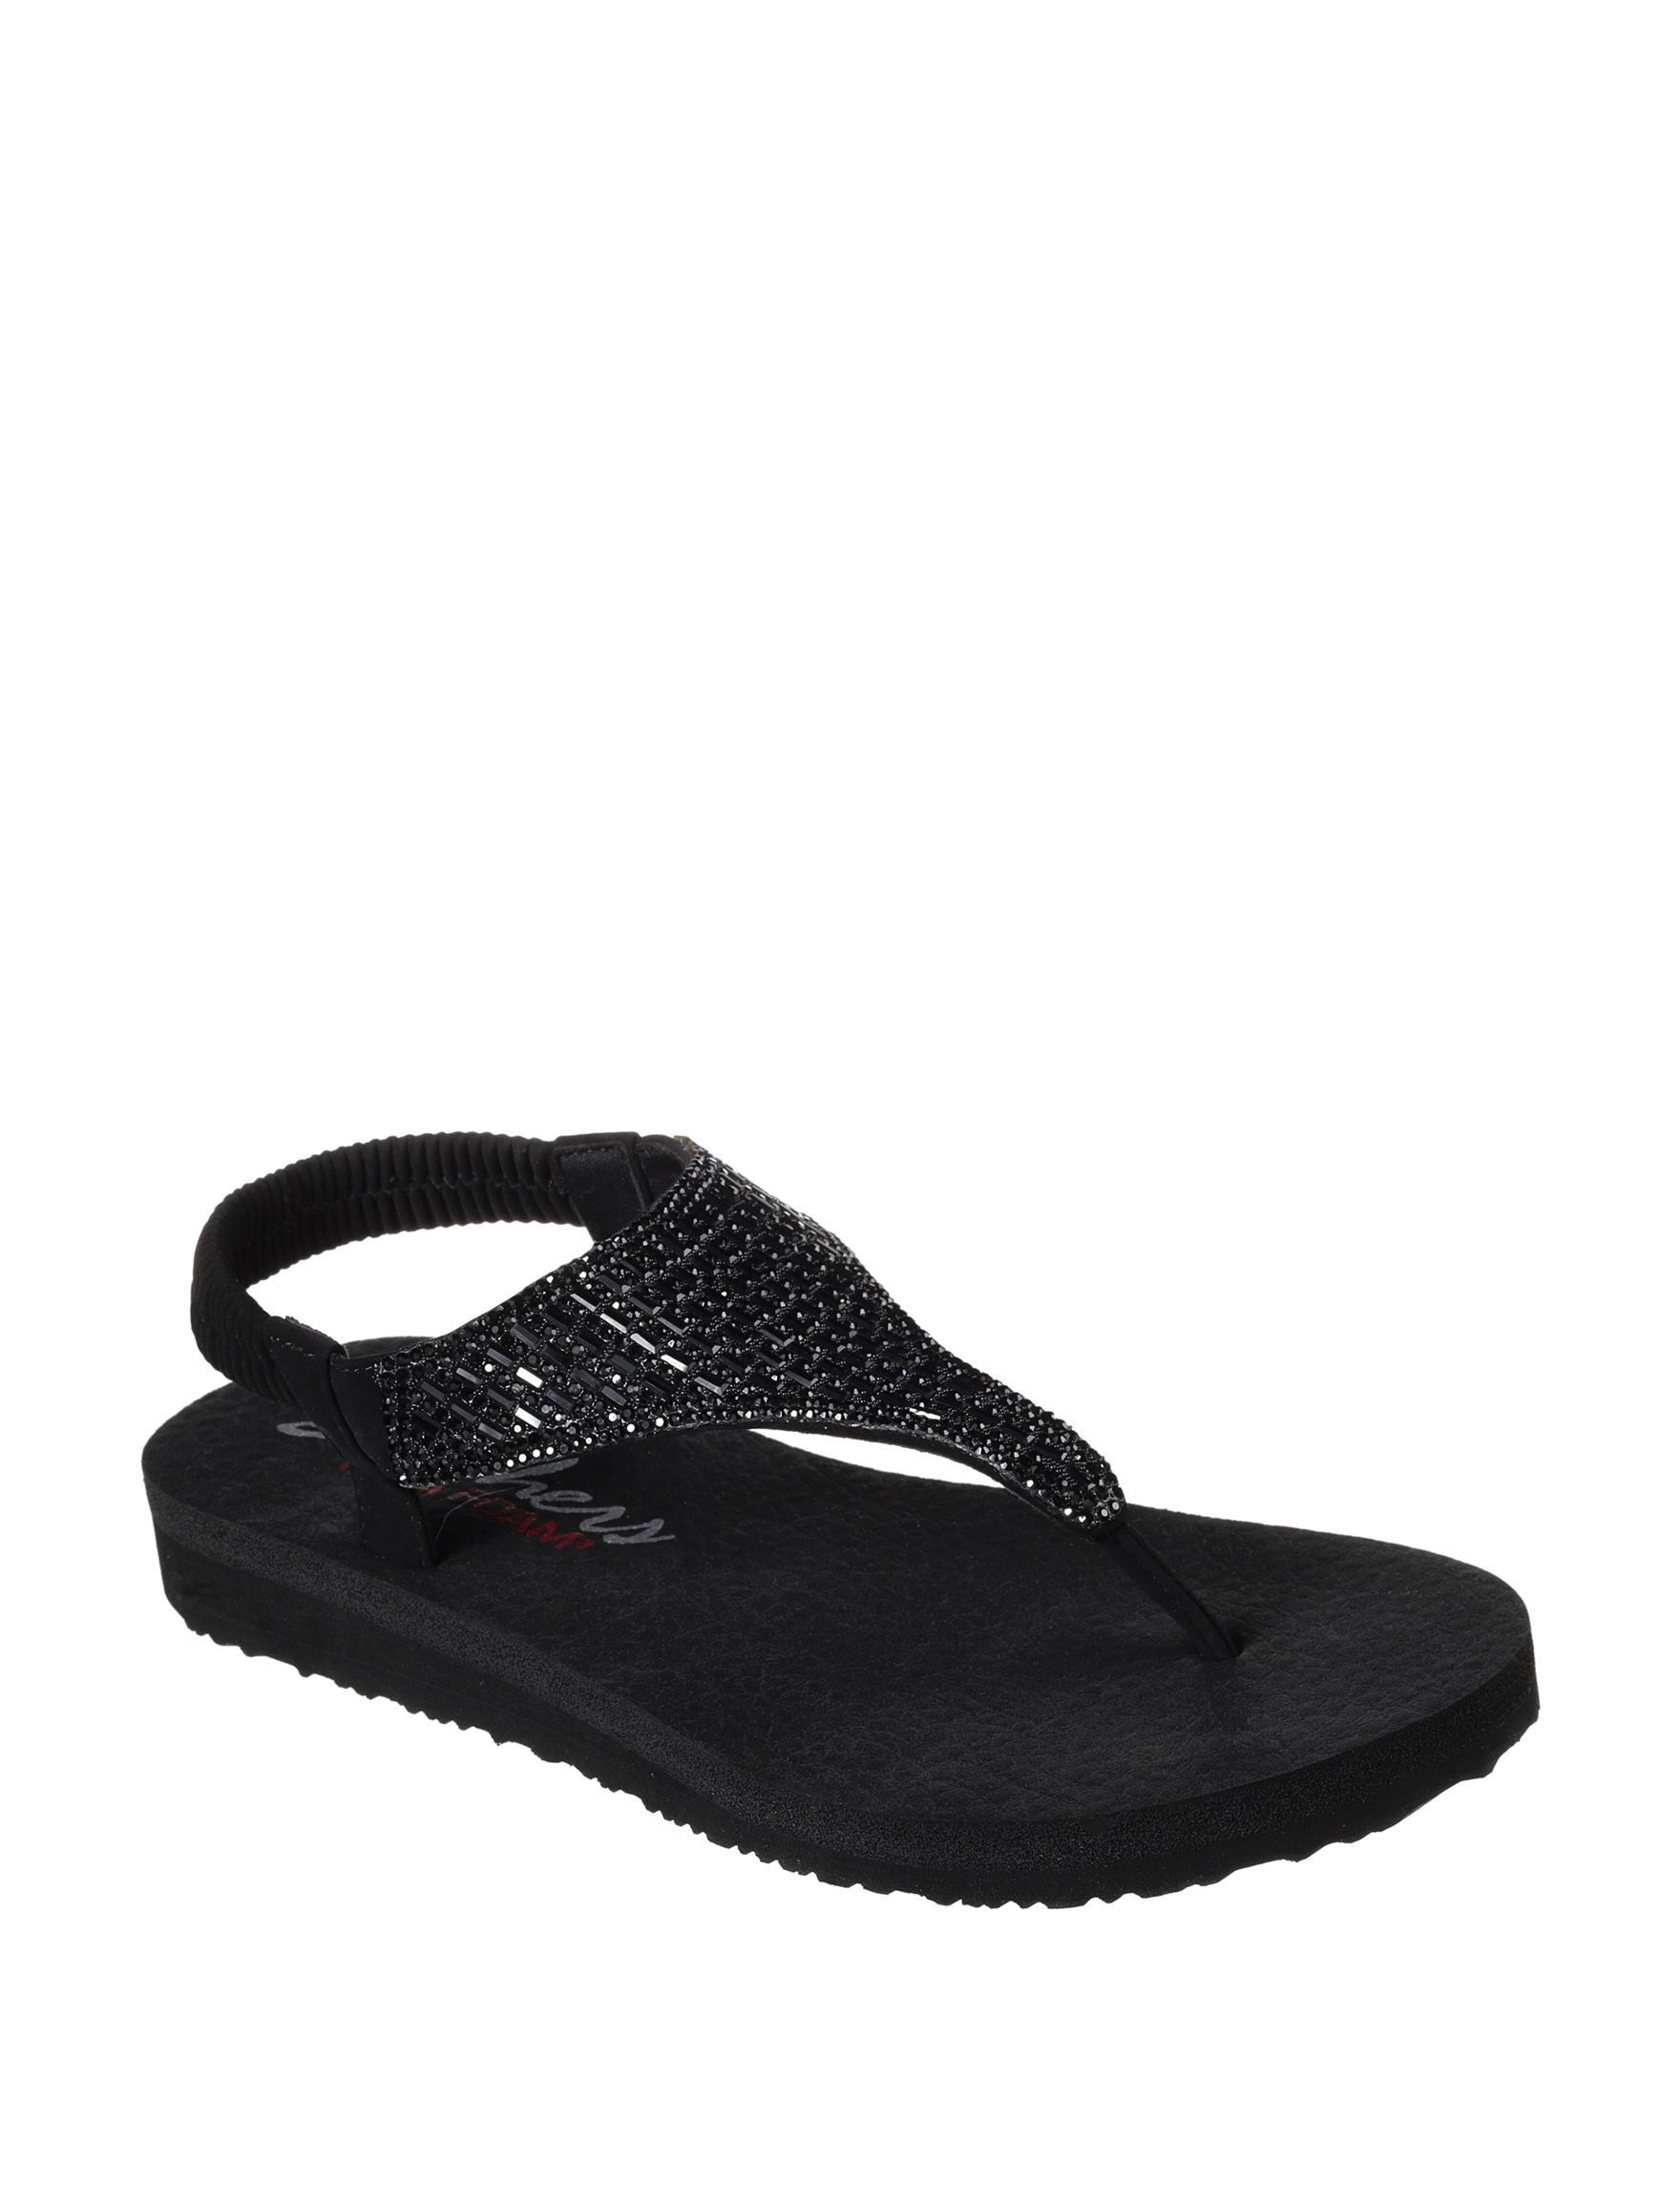 Skechers Black Flip Flops